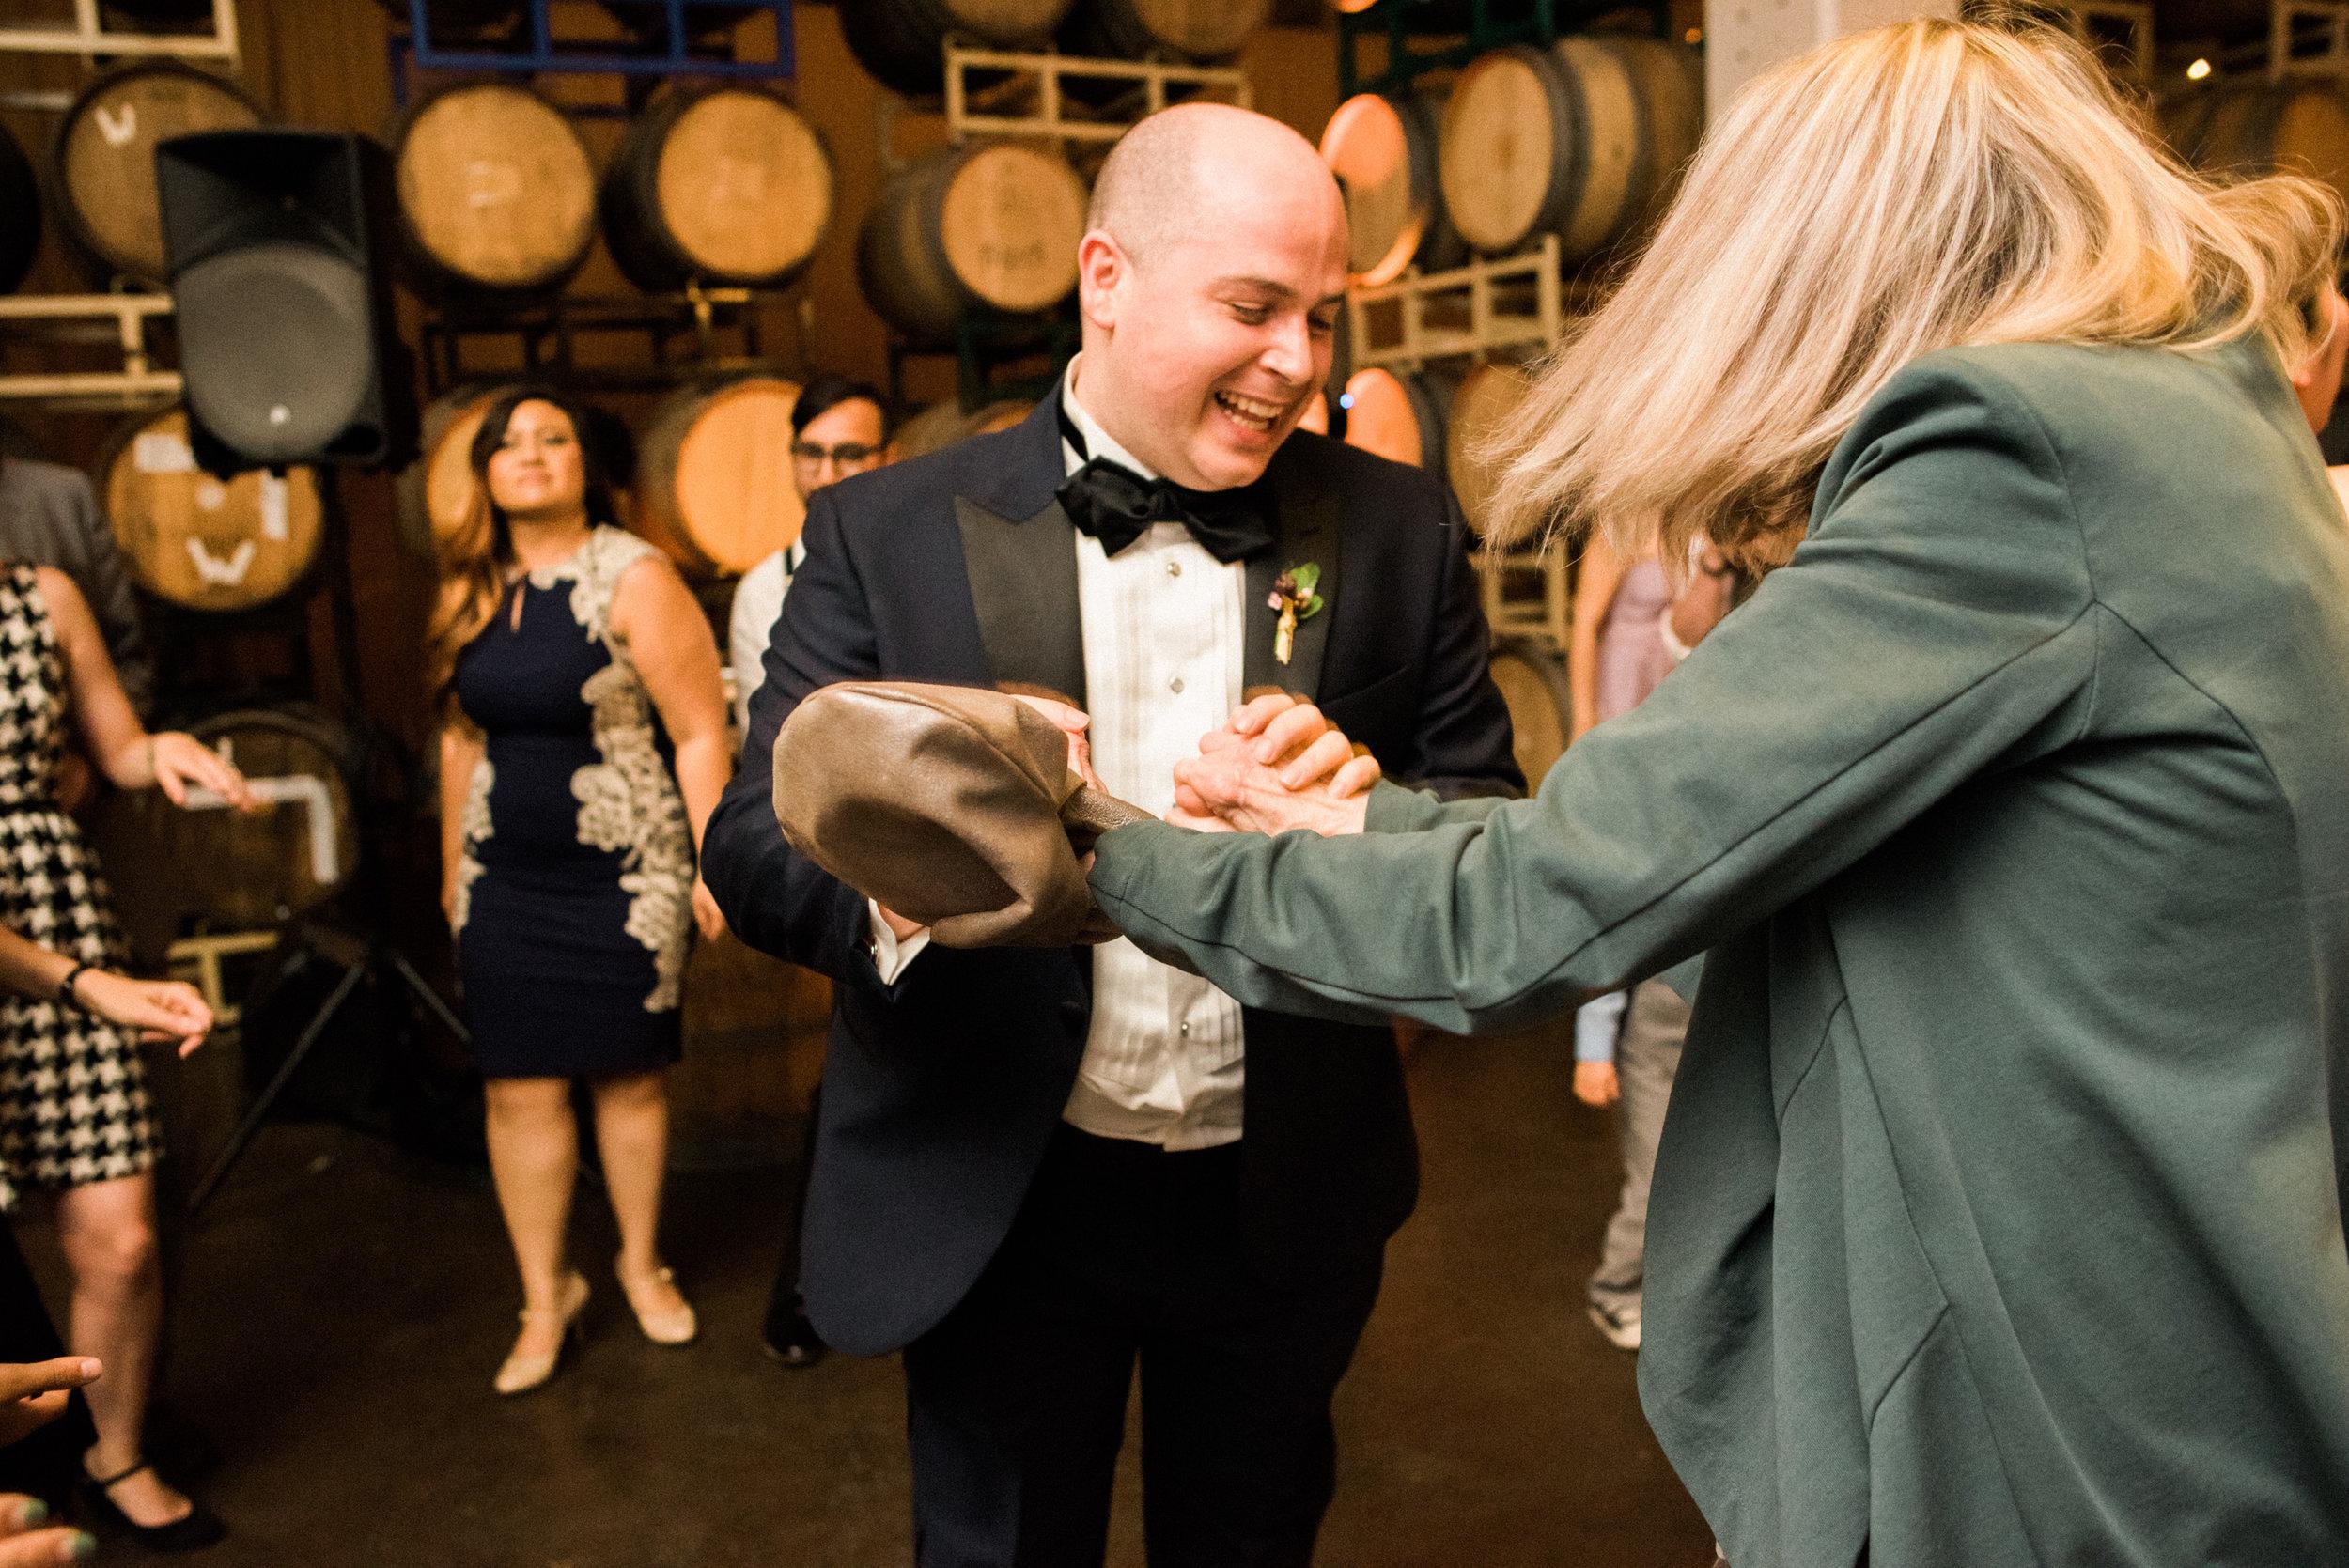 Swedenborgian Church Dogpatch Winery Wedding095.jpg